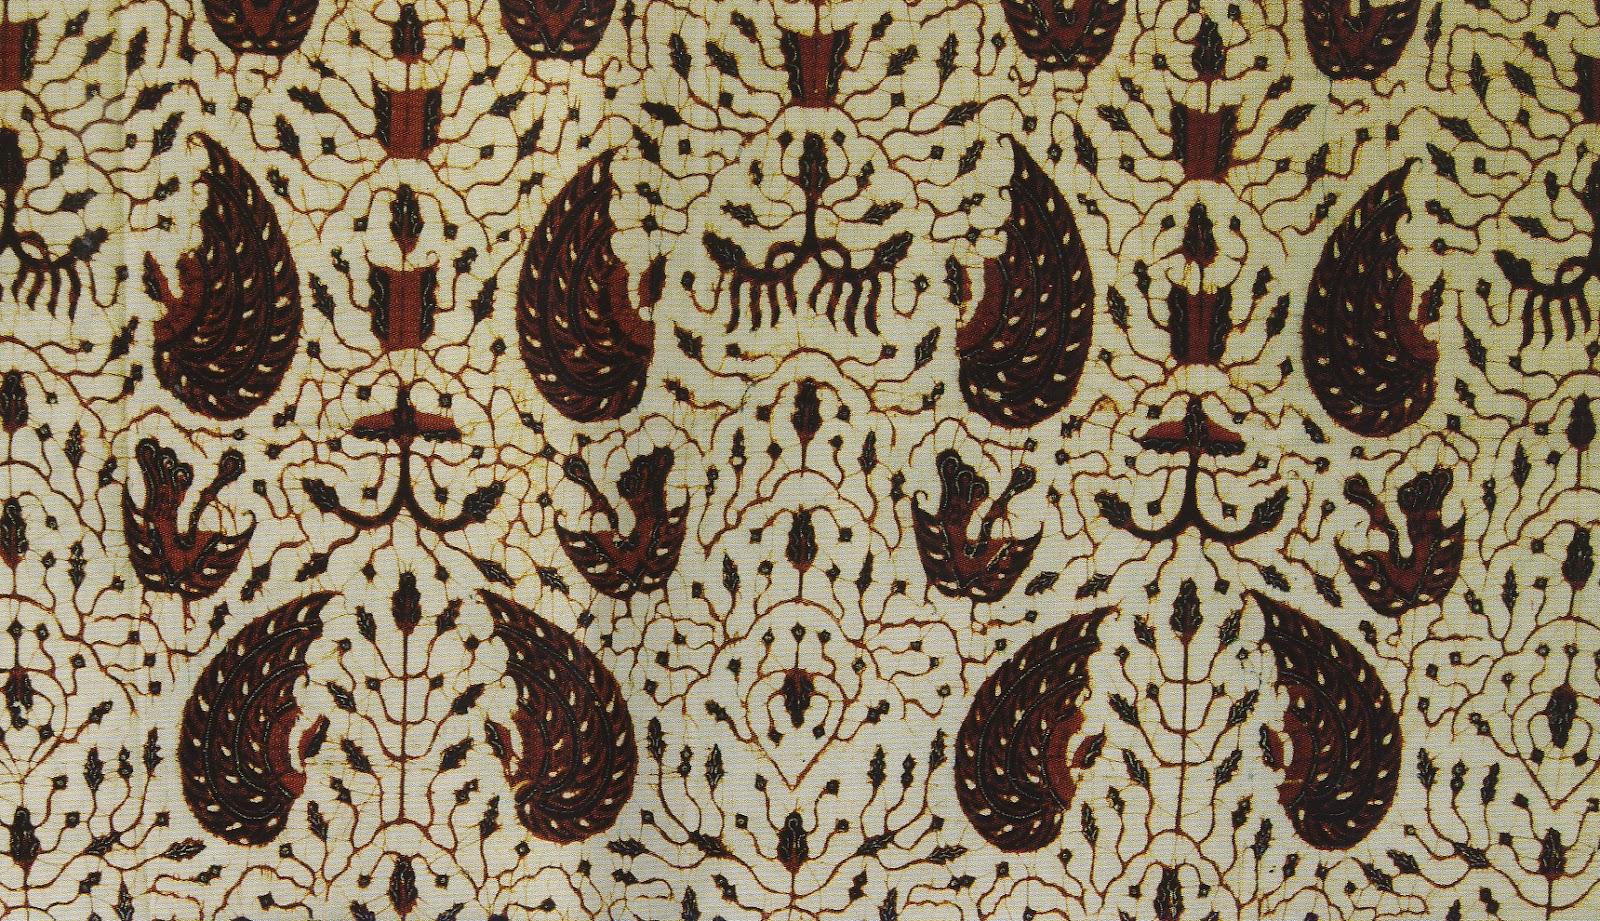 Indonesian Batik Process Batik art is art image on the